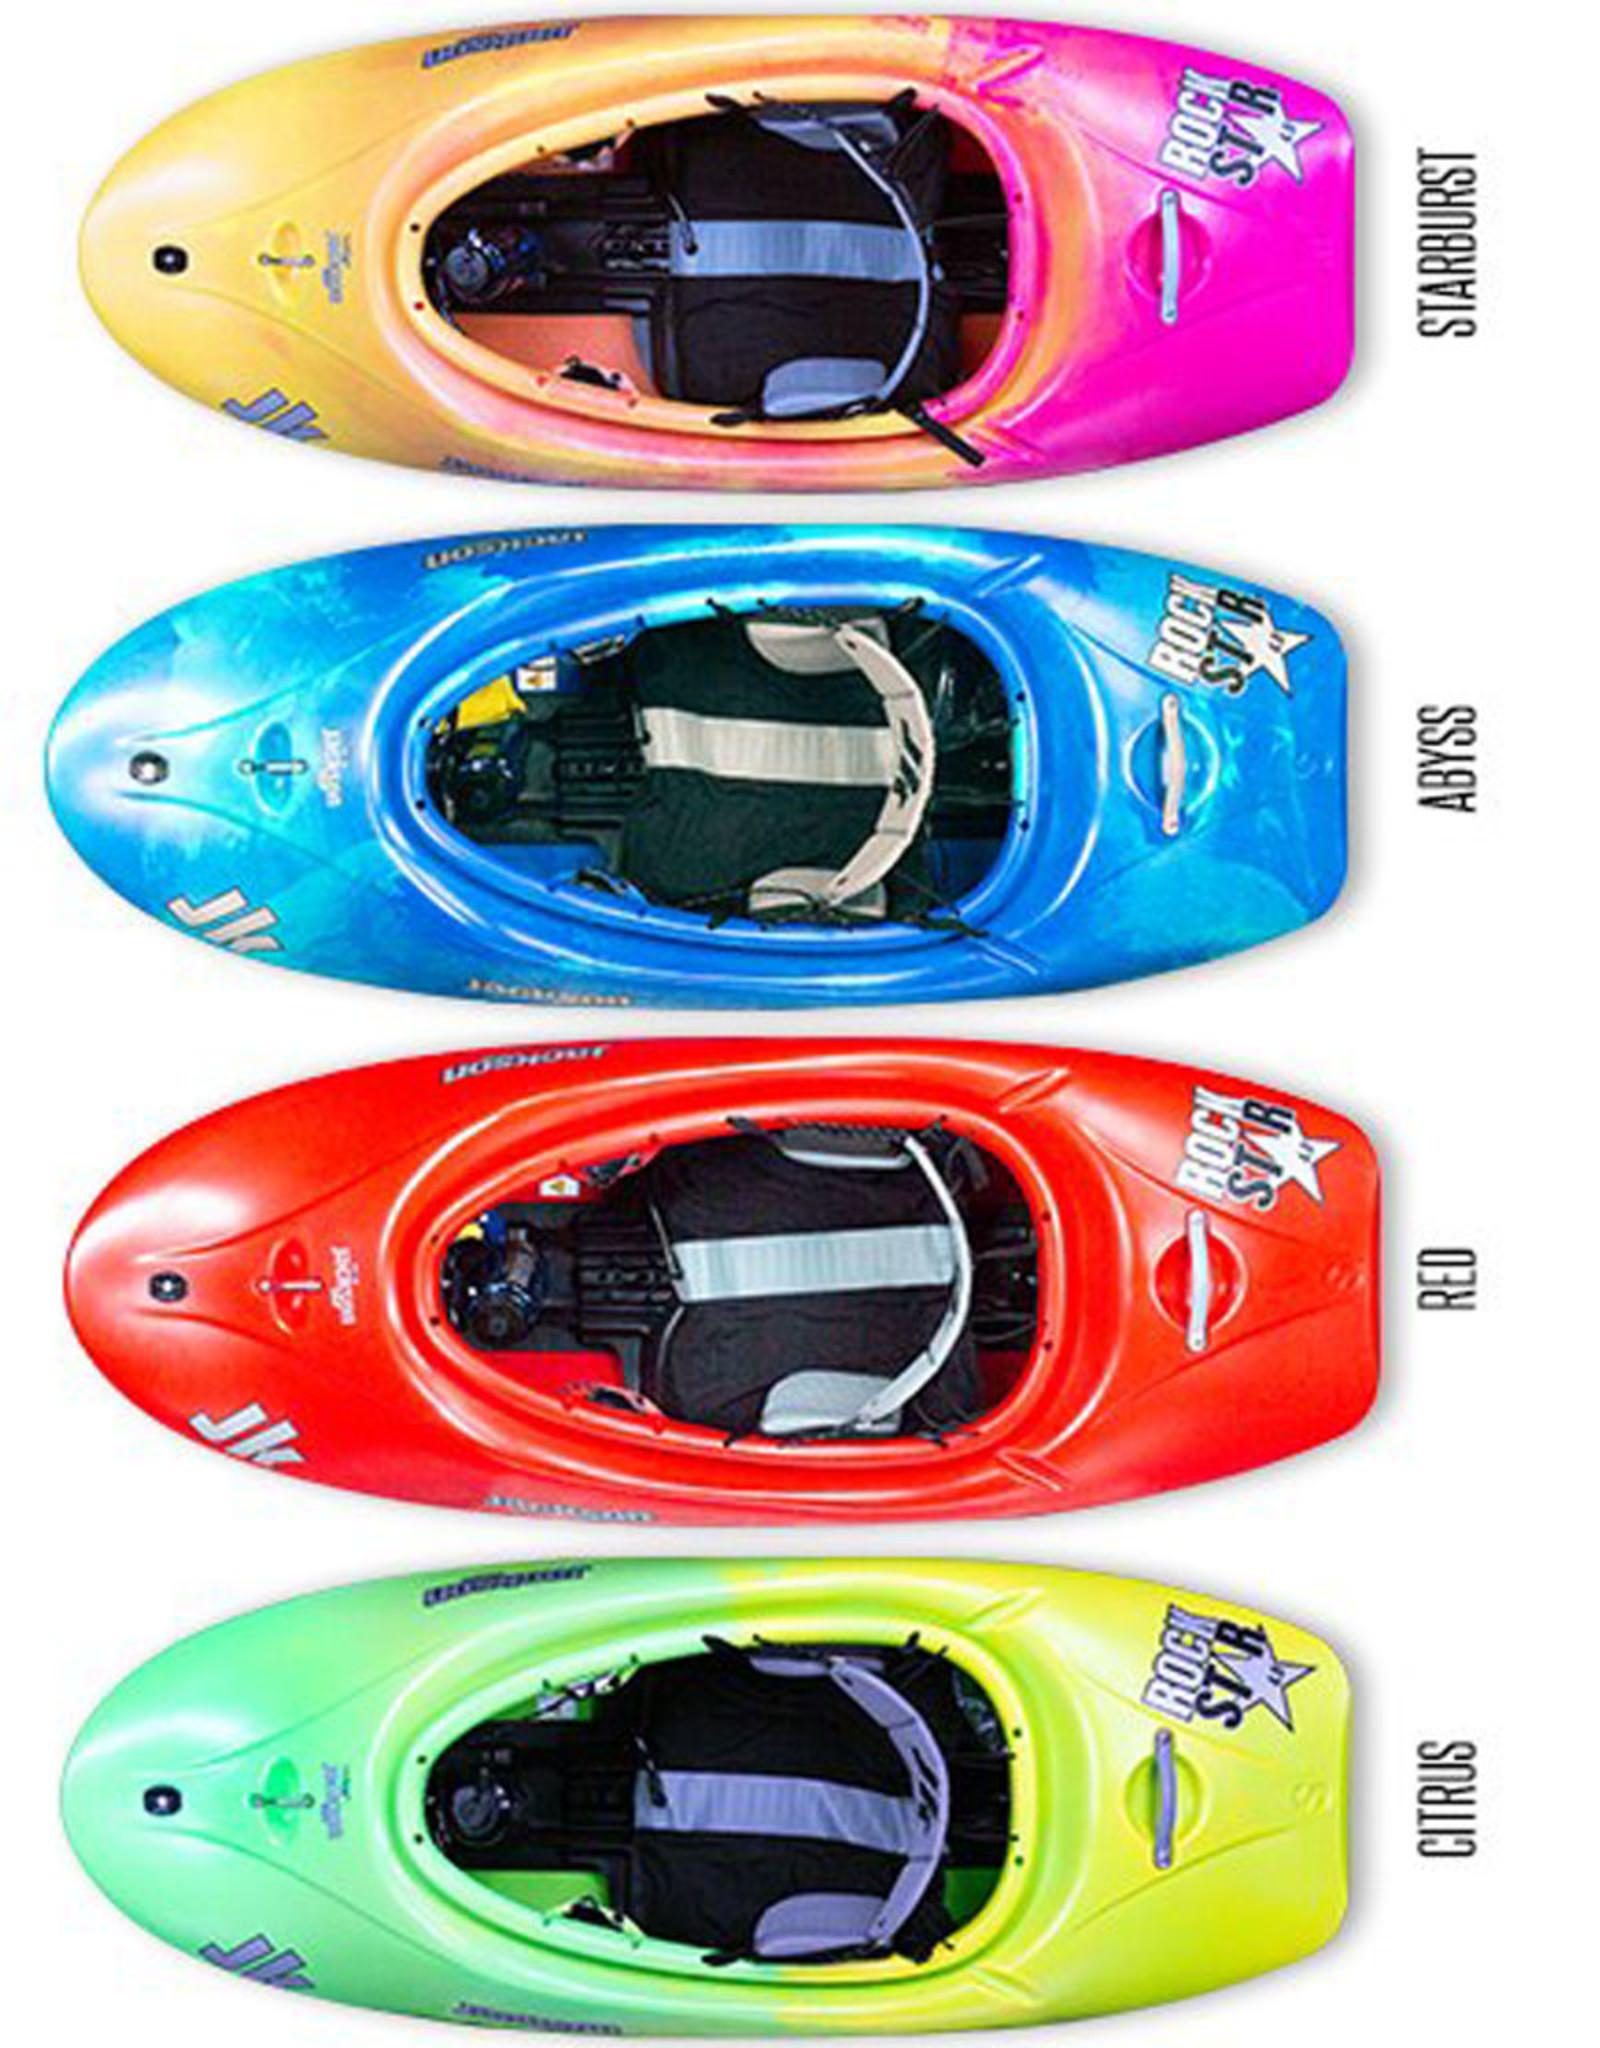 Jackson Kayak Jackson Rockstar 4.0